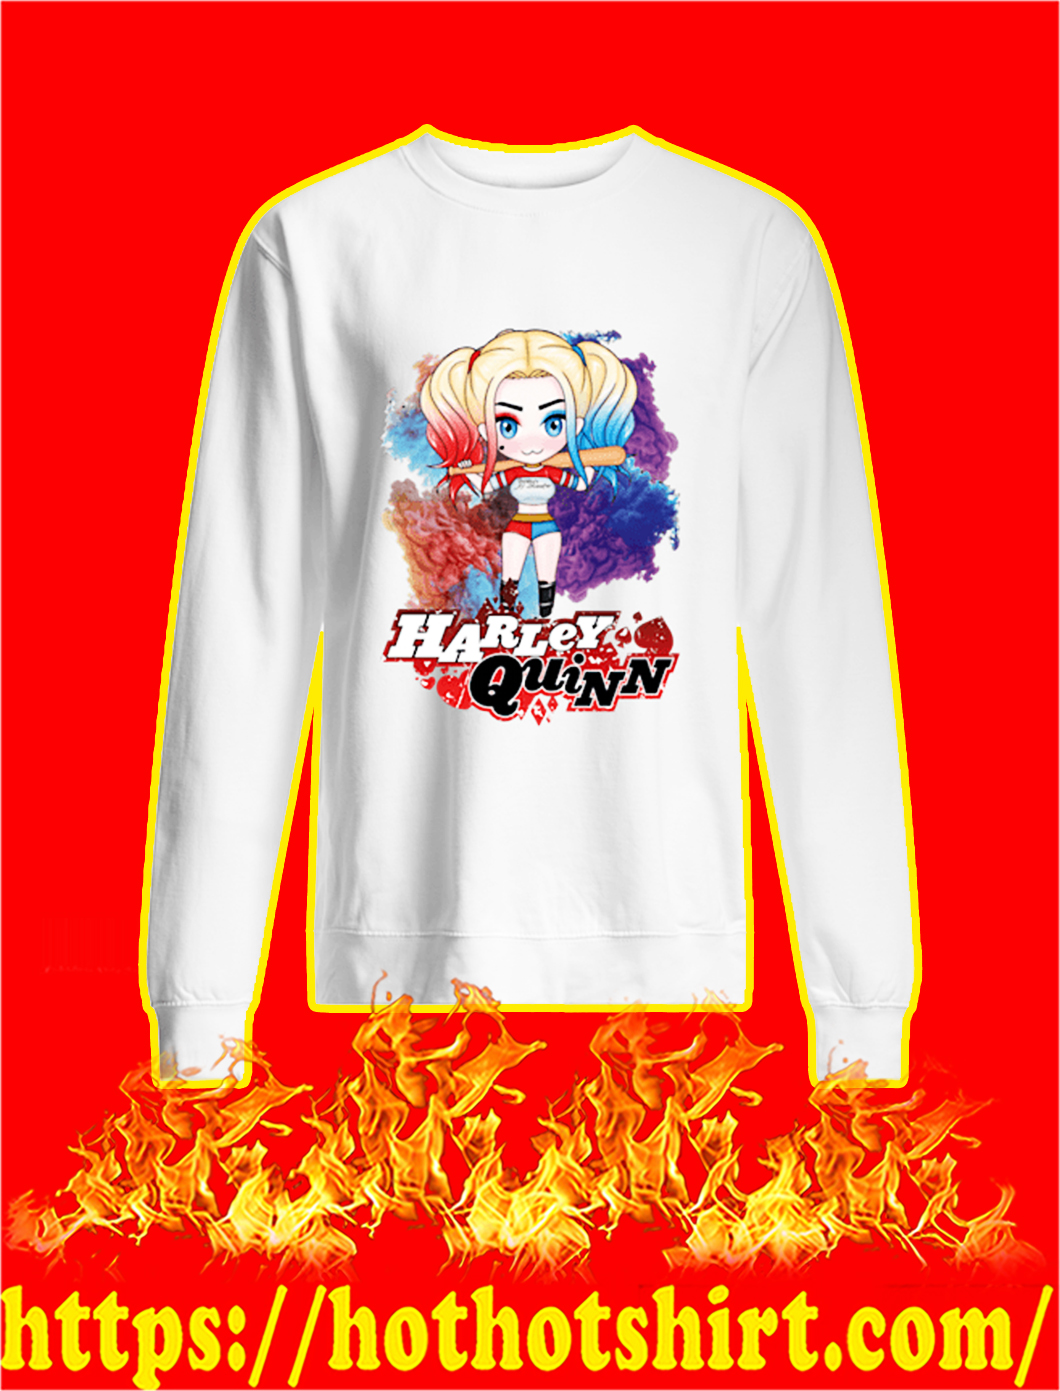 Harley Quinn Chibi sweatshirt